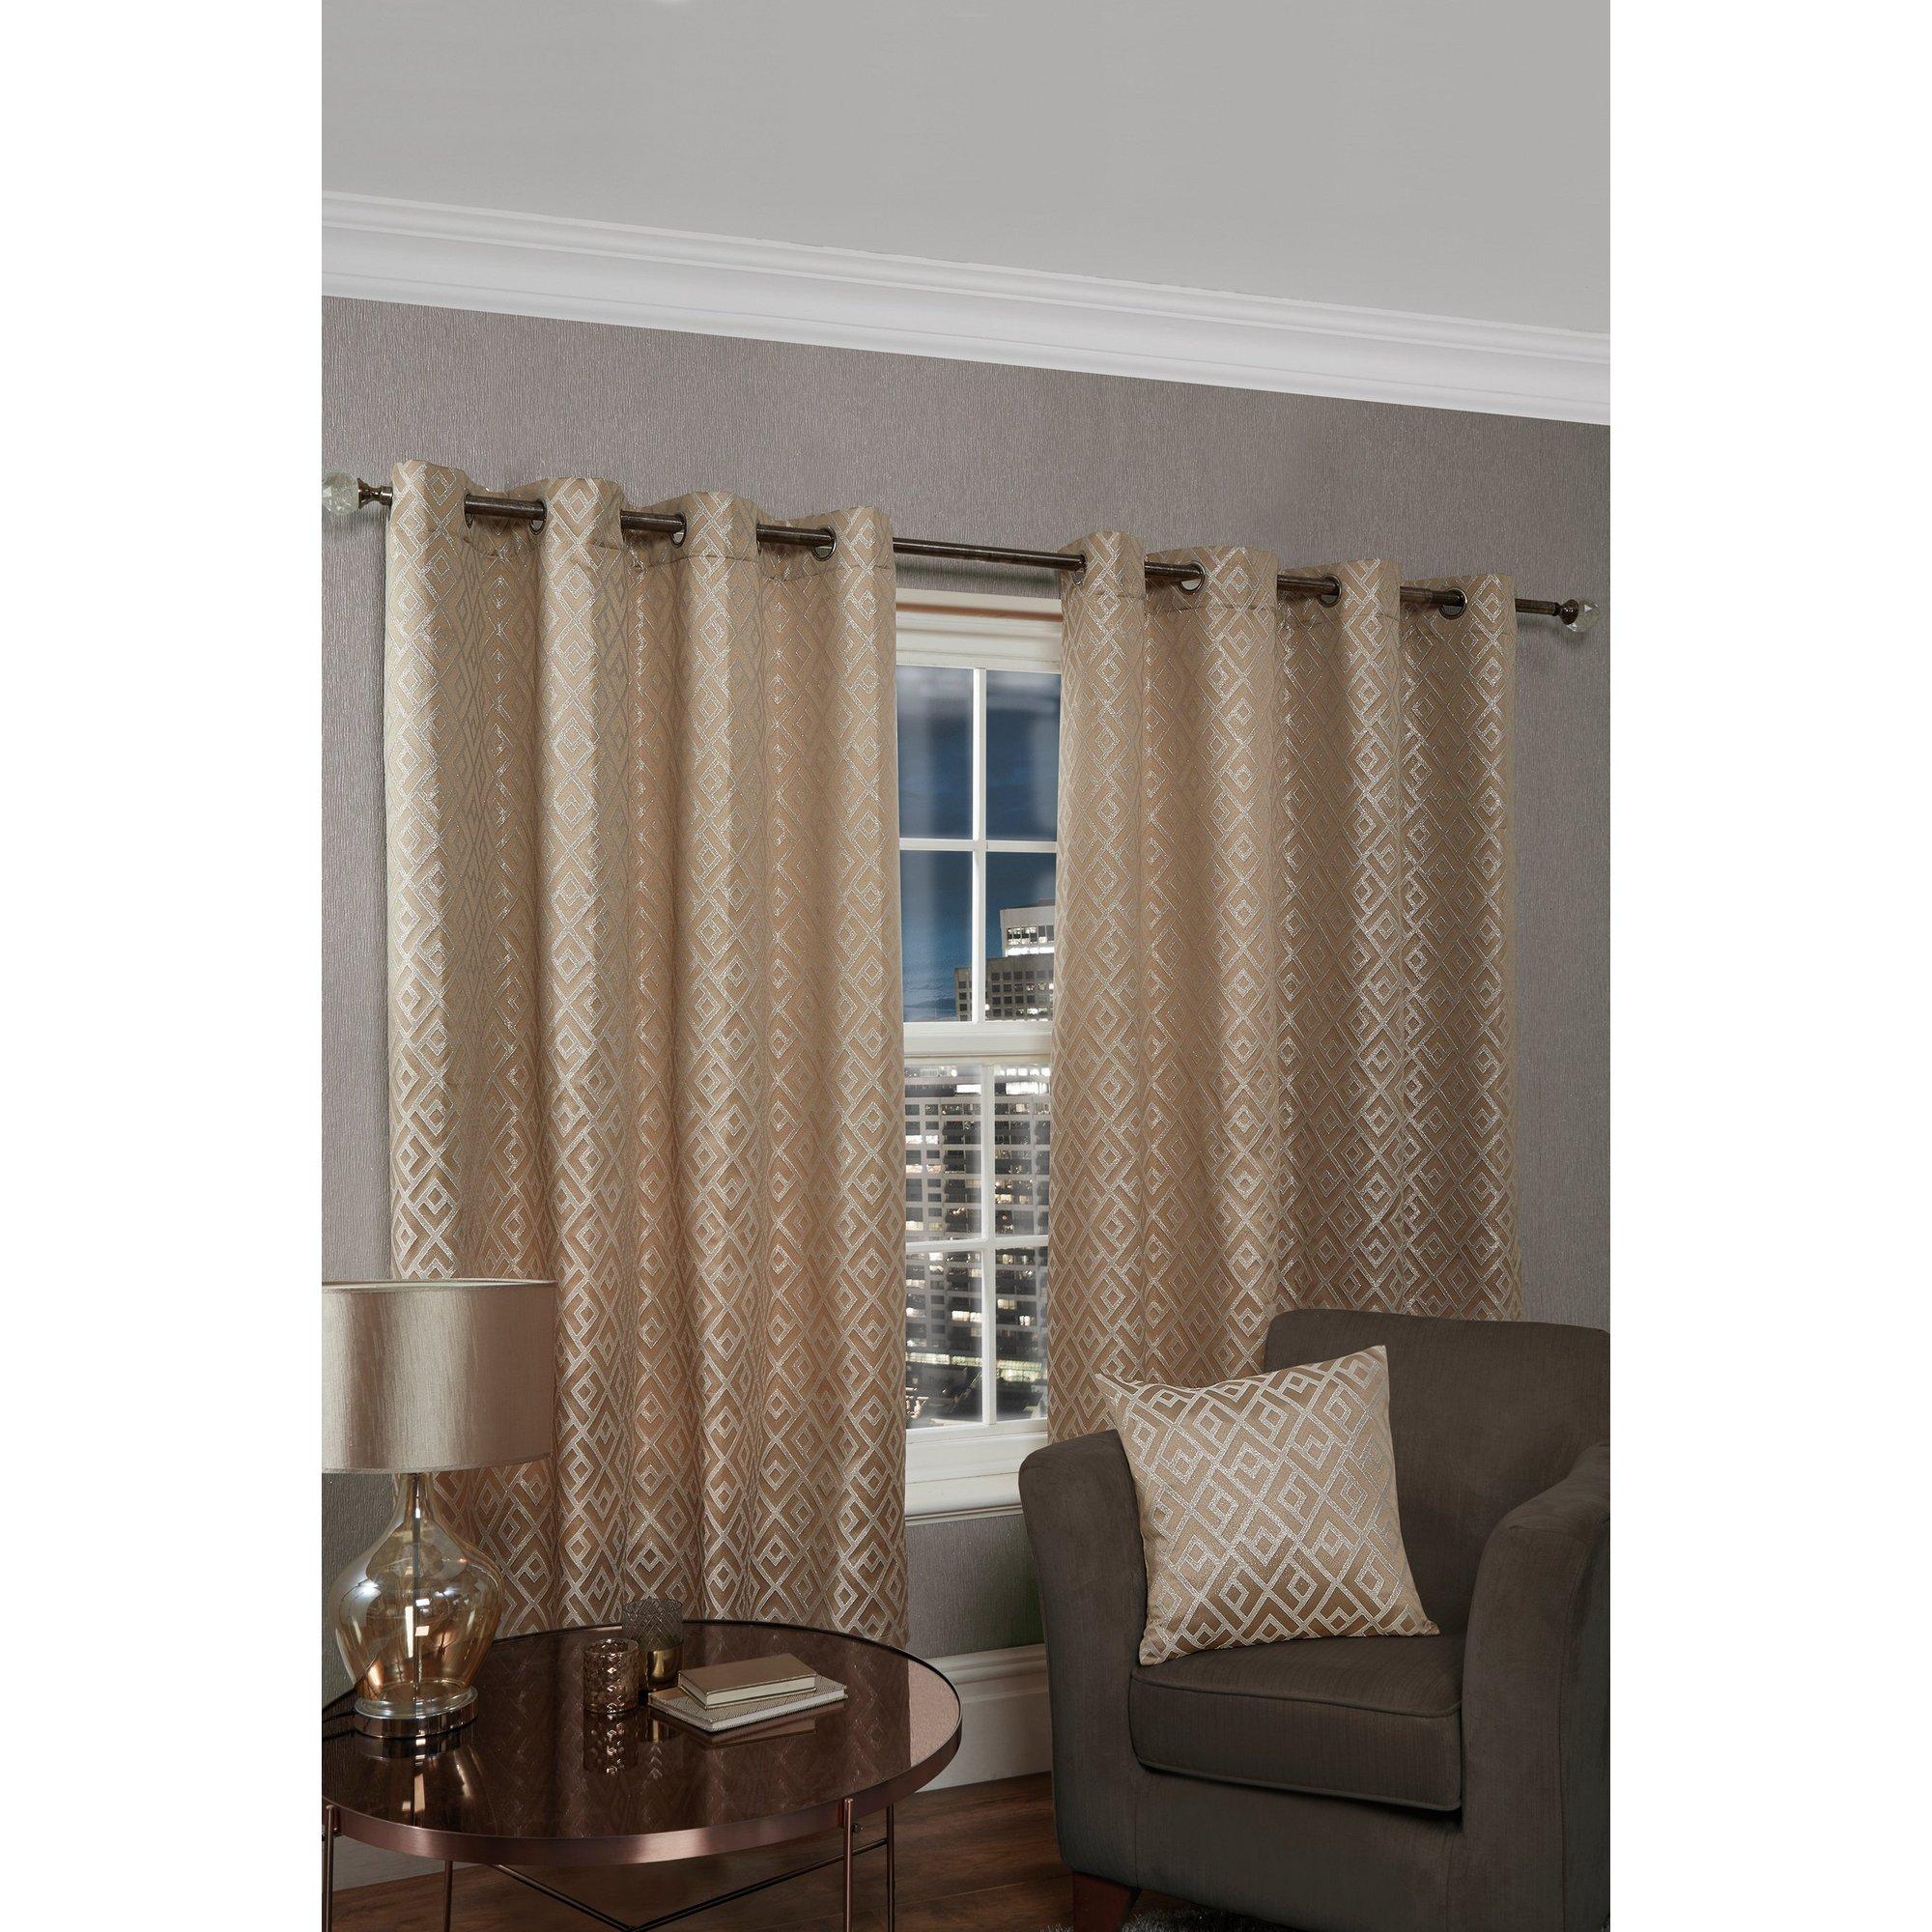 Image of Athens Metallic Geo Lined Eyelet Curtains